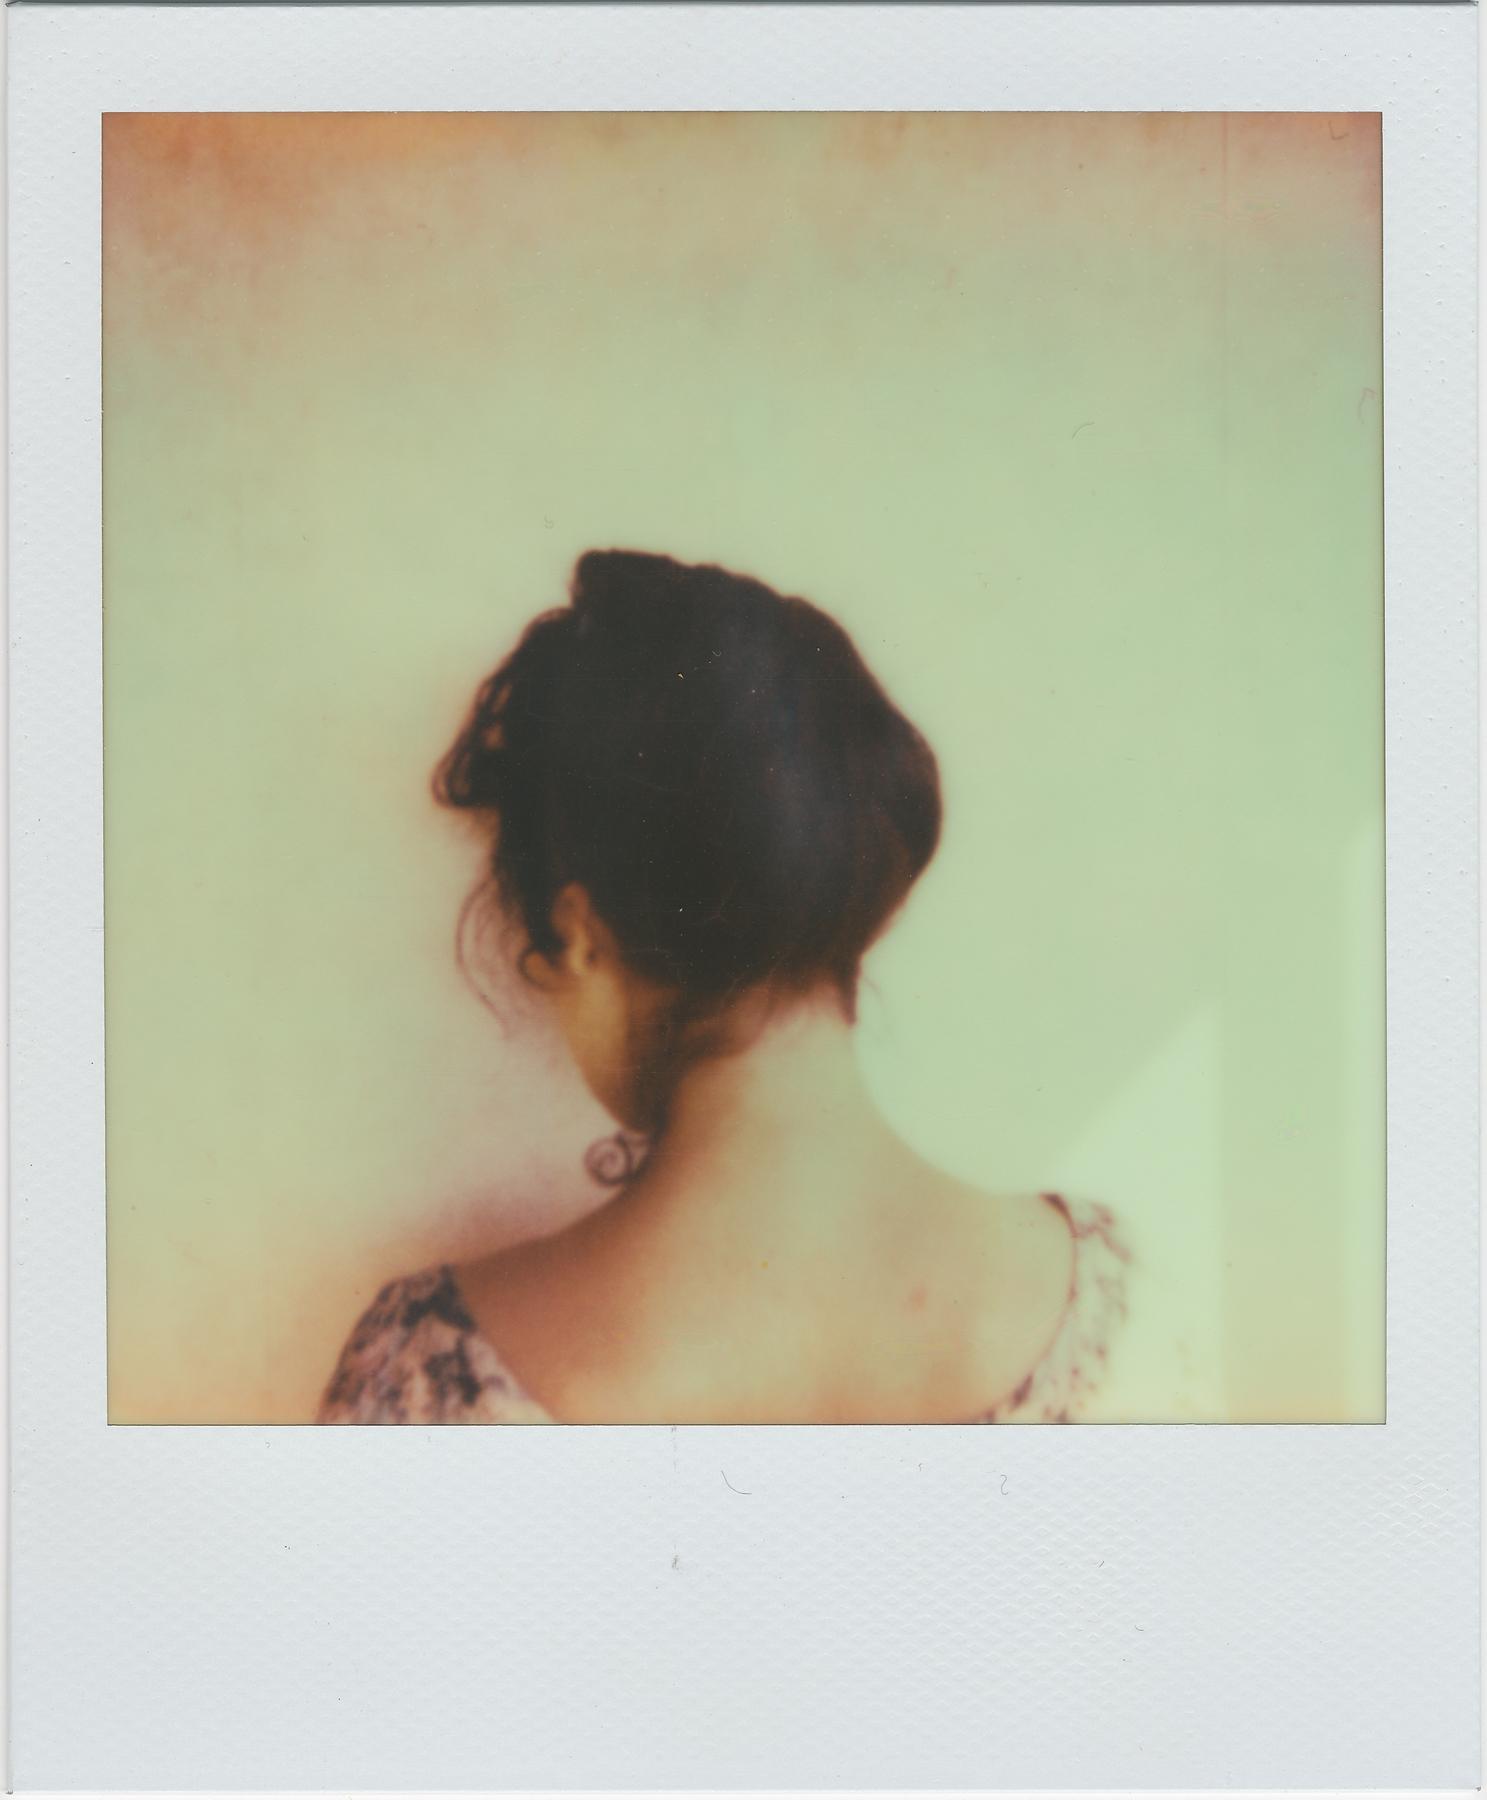 untitled | polaroid 600 camera | IP px680 | celeste ortiz